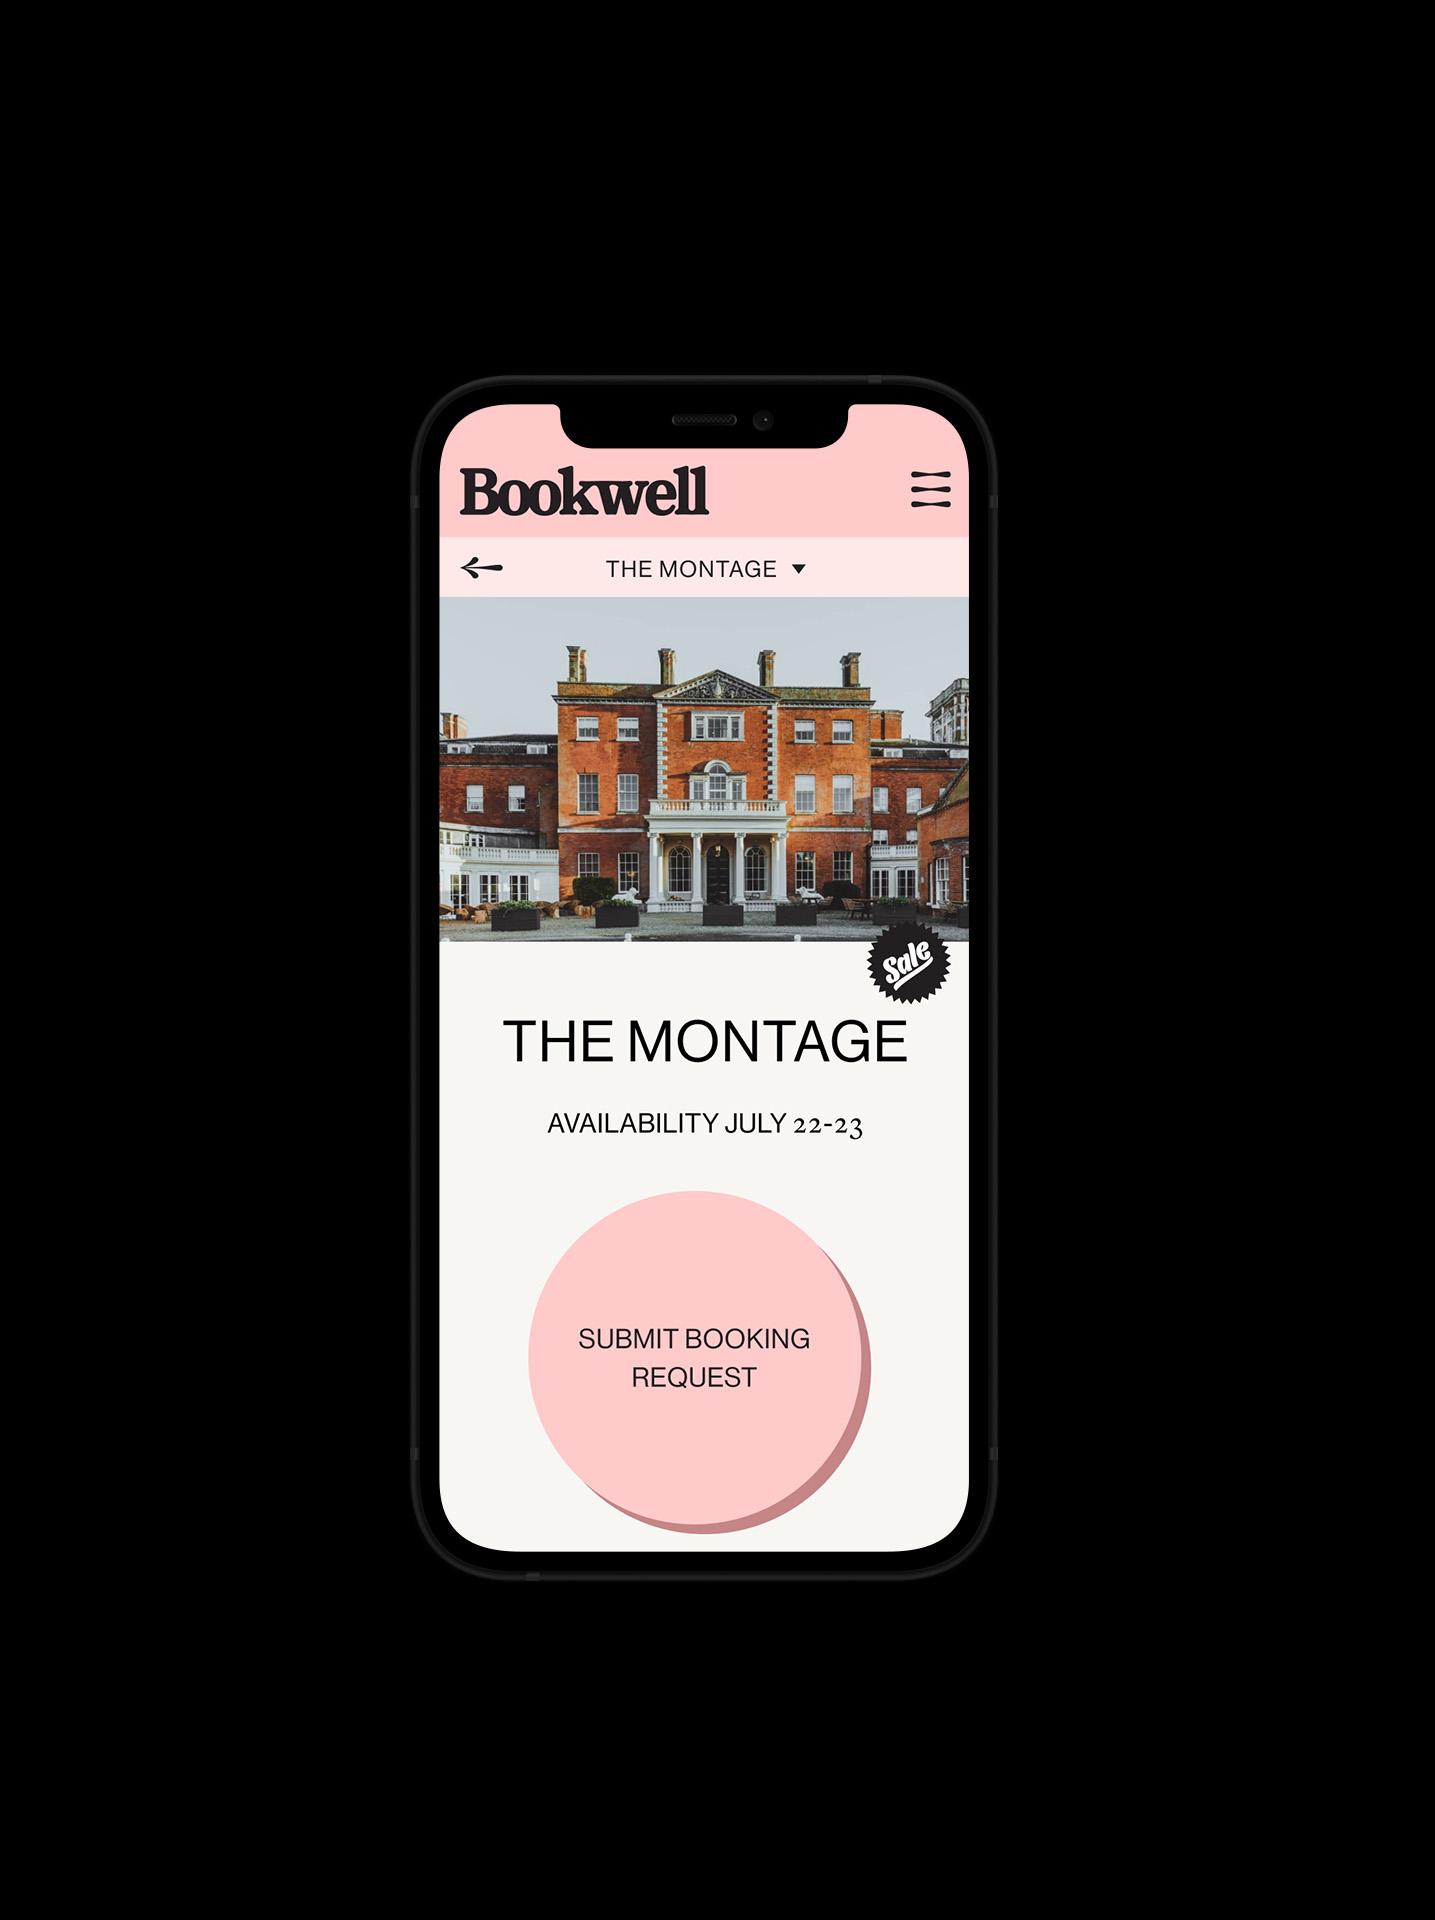 Bookwell_0004_Phone Hotel